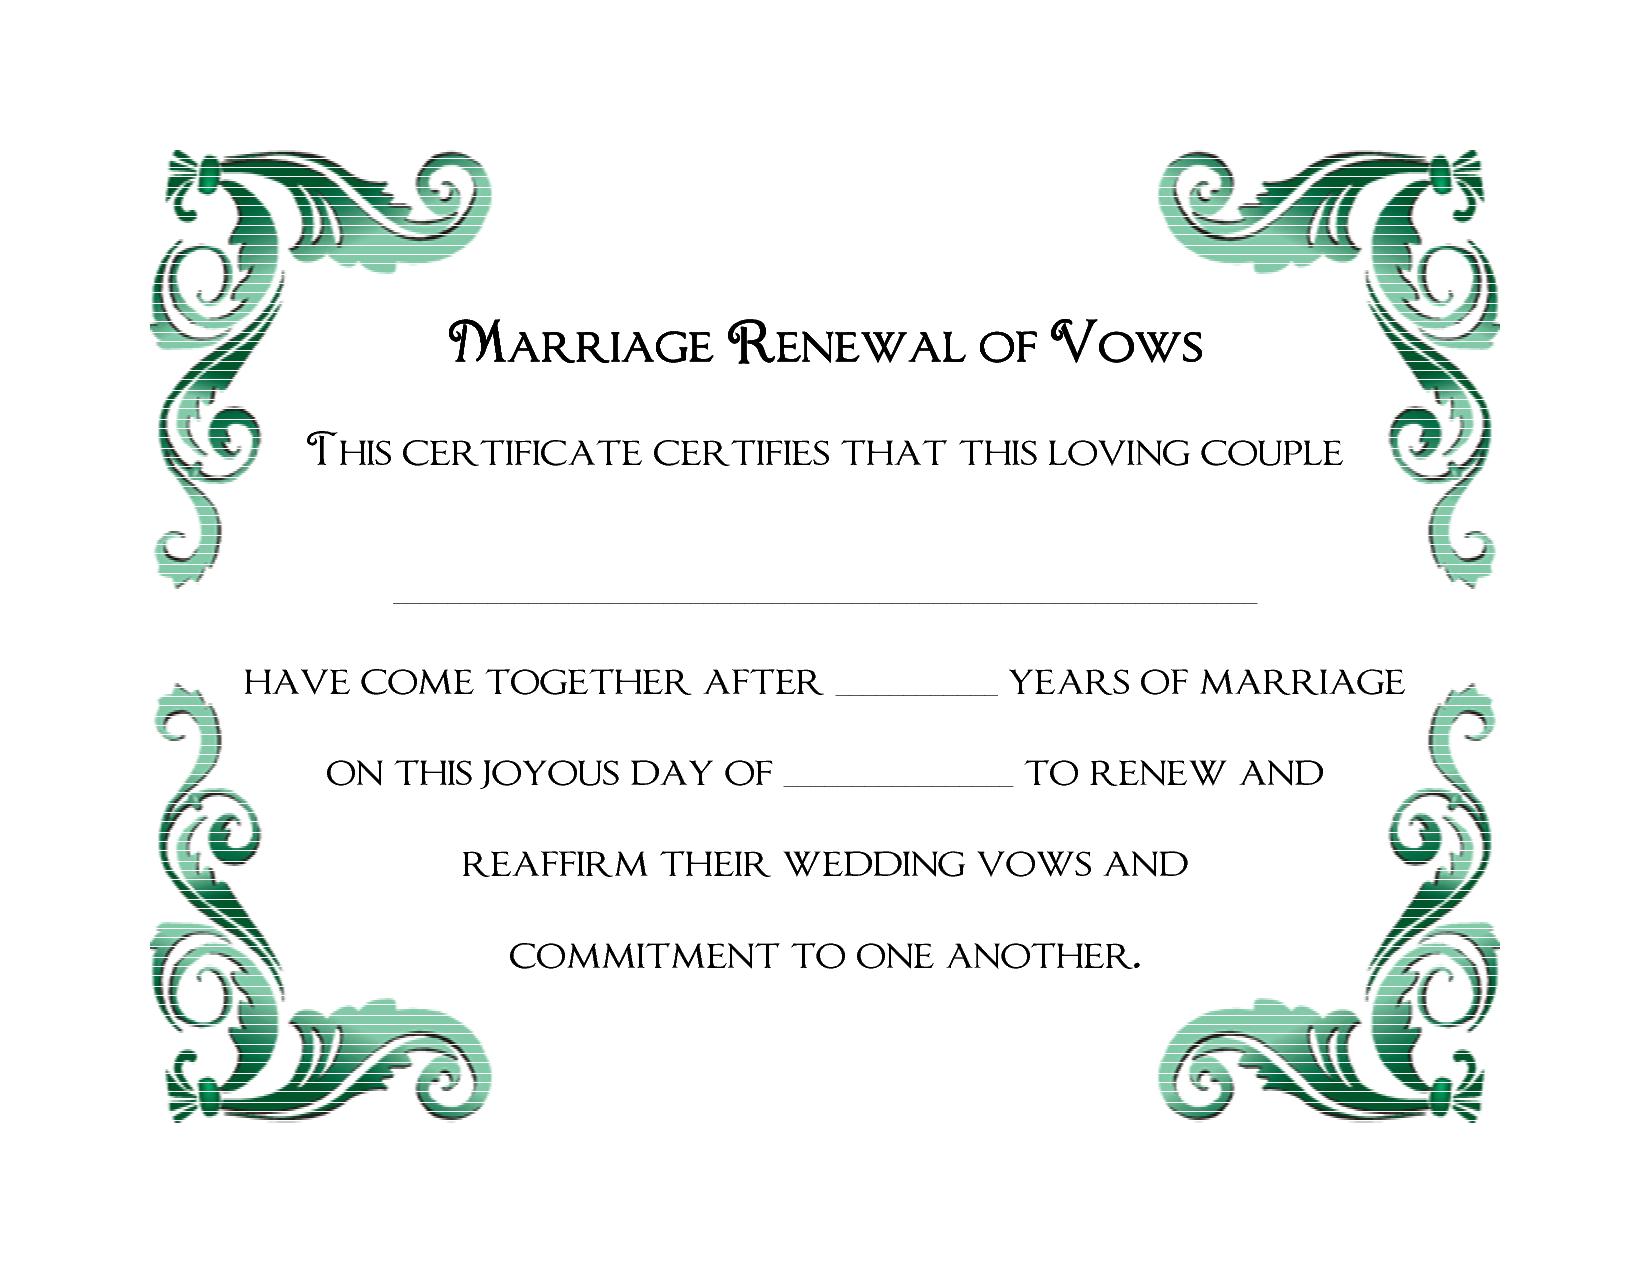 Party Express Hallmark Invitations Templates